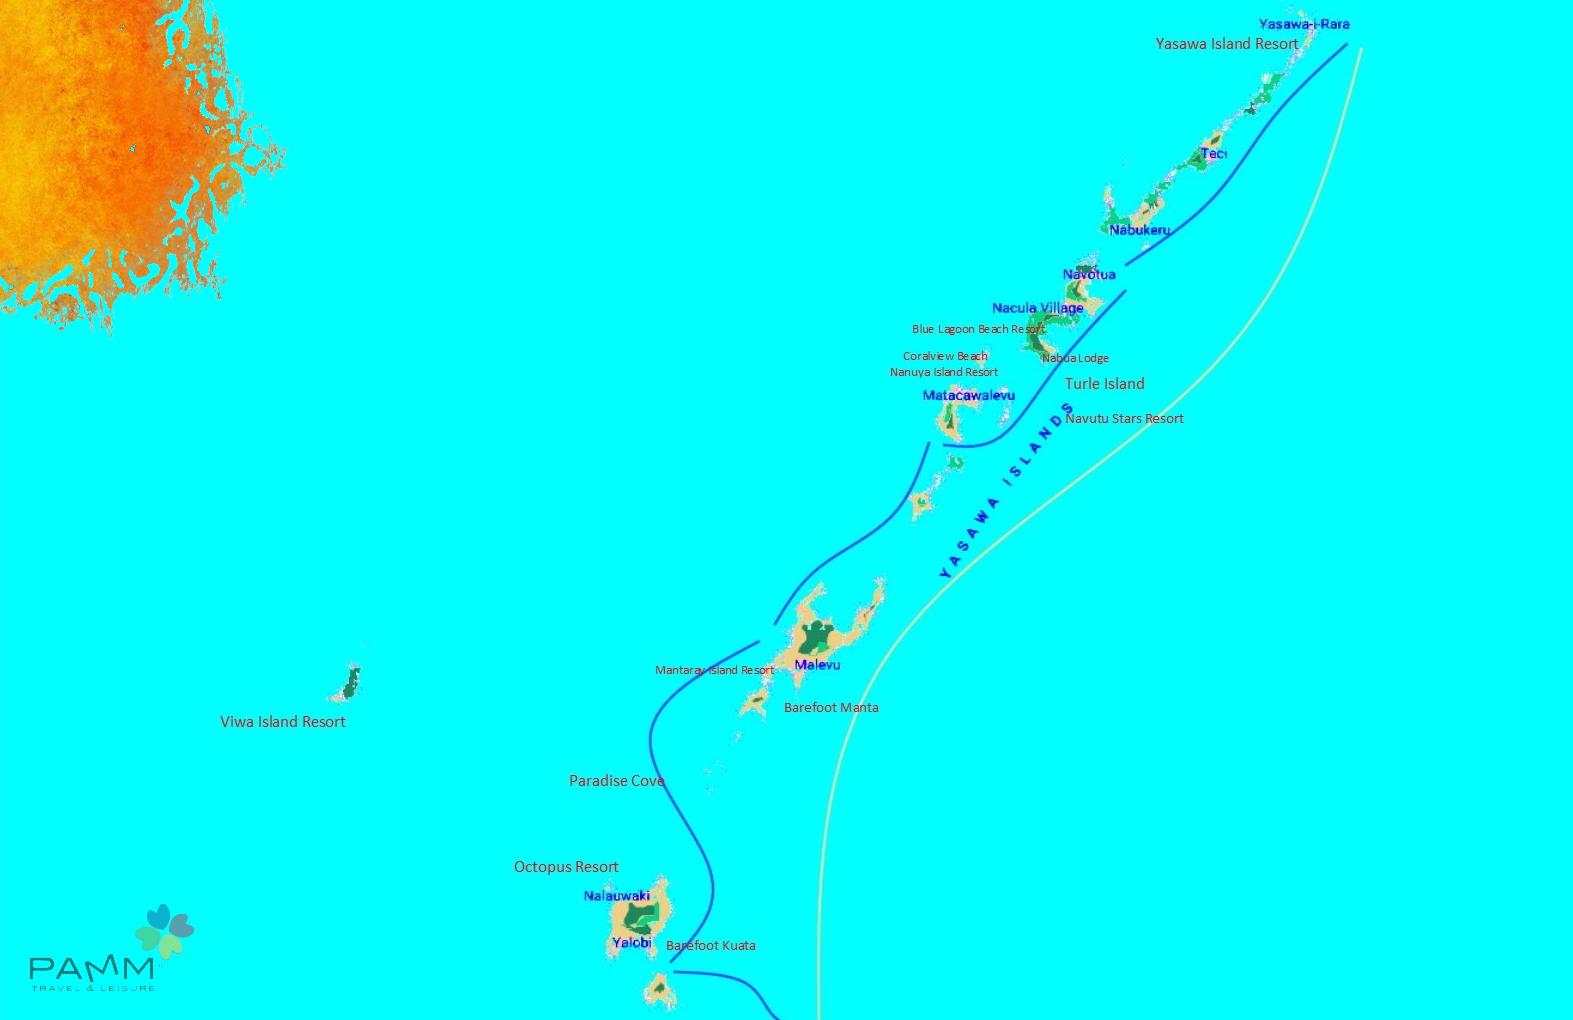 Isole Yasawa Fiji Resort e Lodge